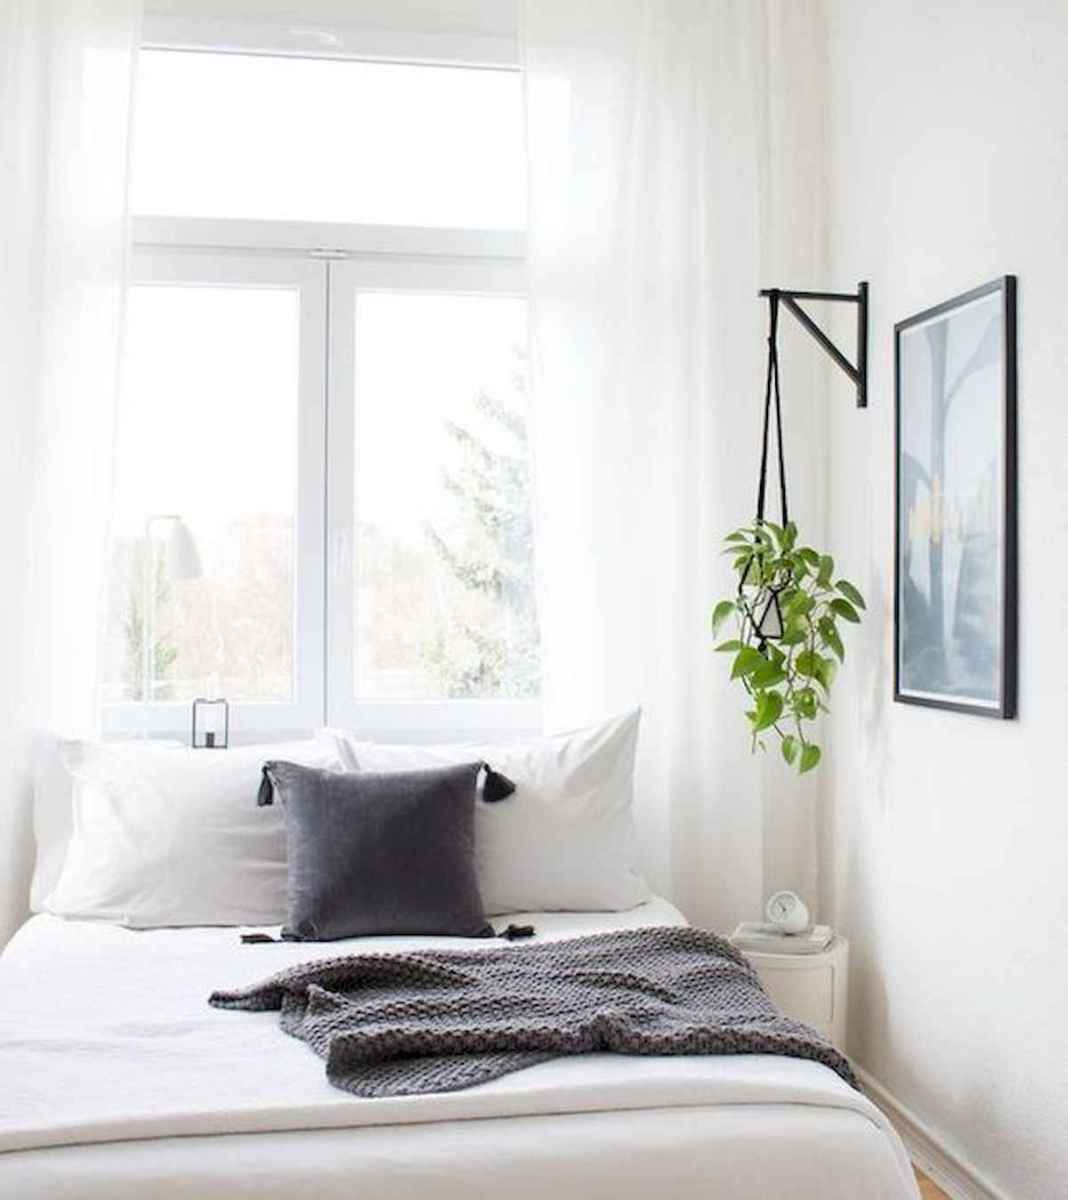 40 creative small apartment bedroom decor ideas (4)